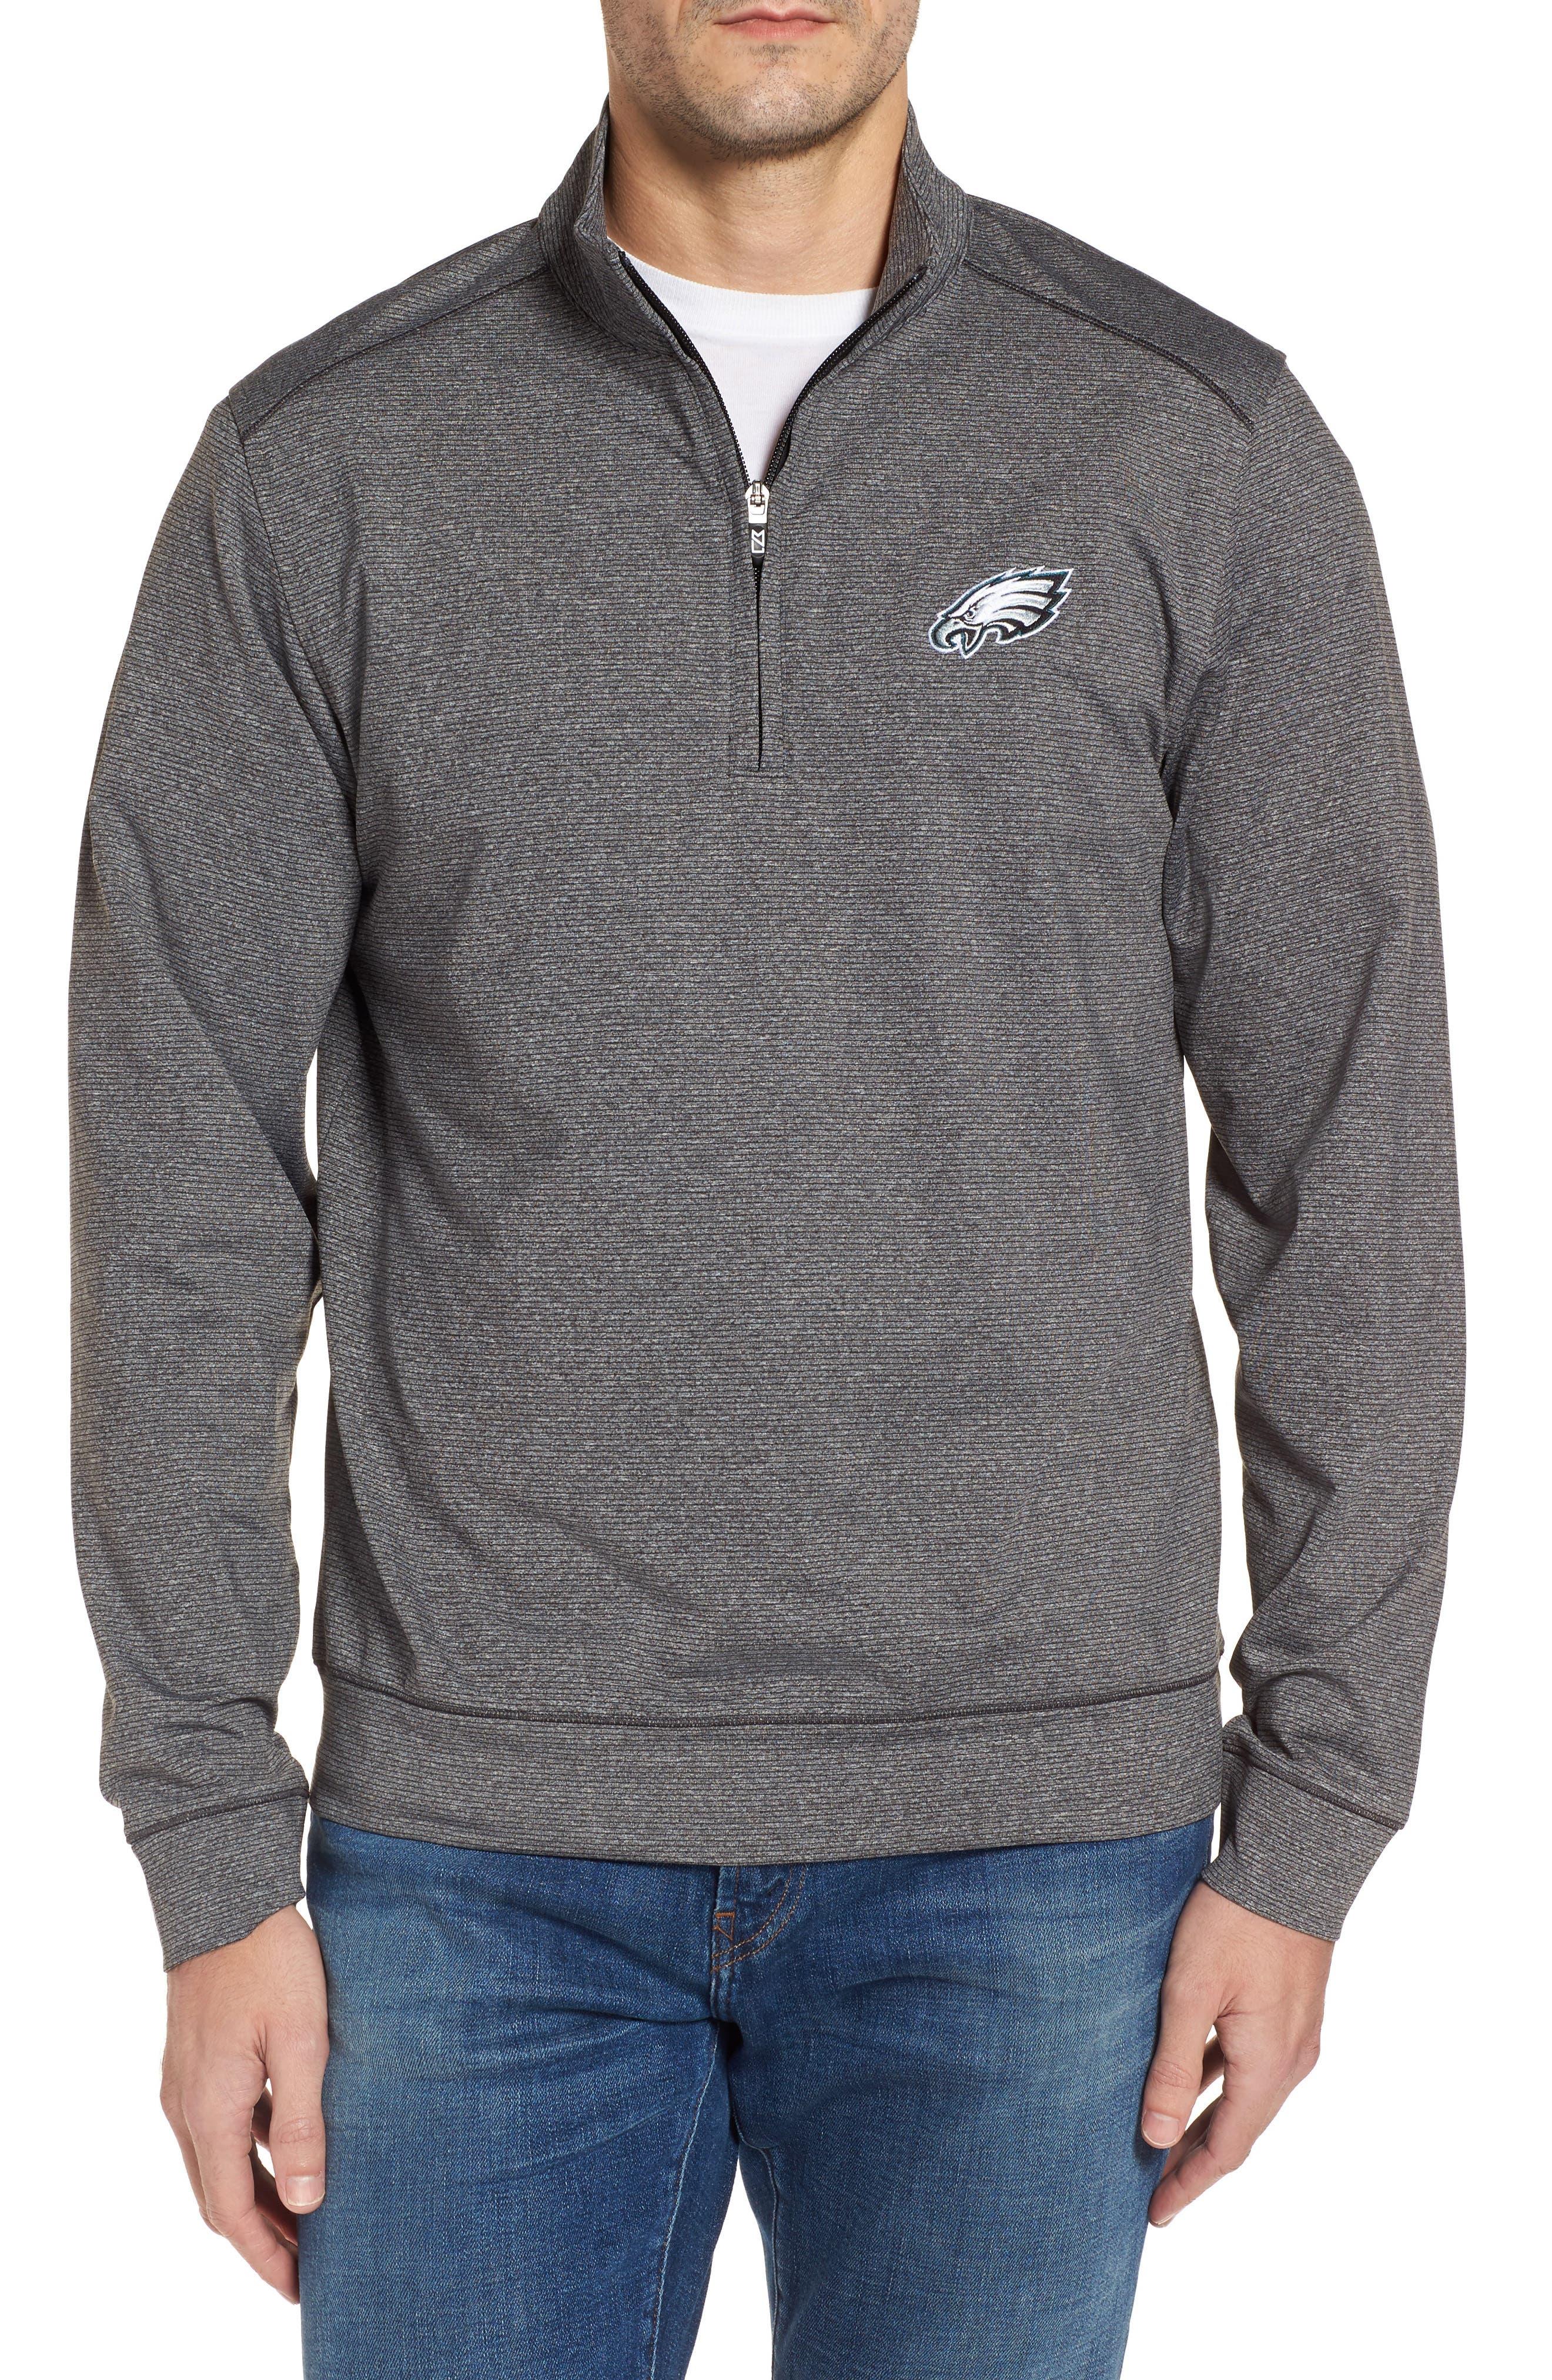 Shoreline - Philadelphia Eagles Half Zip Sweatshirt,                         Main,                         color, Charcoal Heather